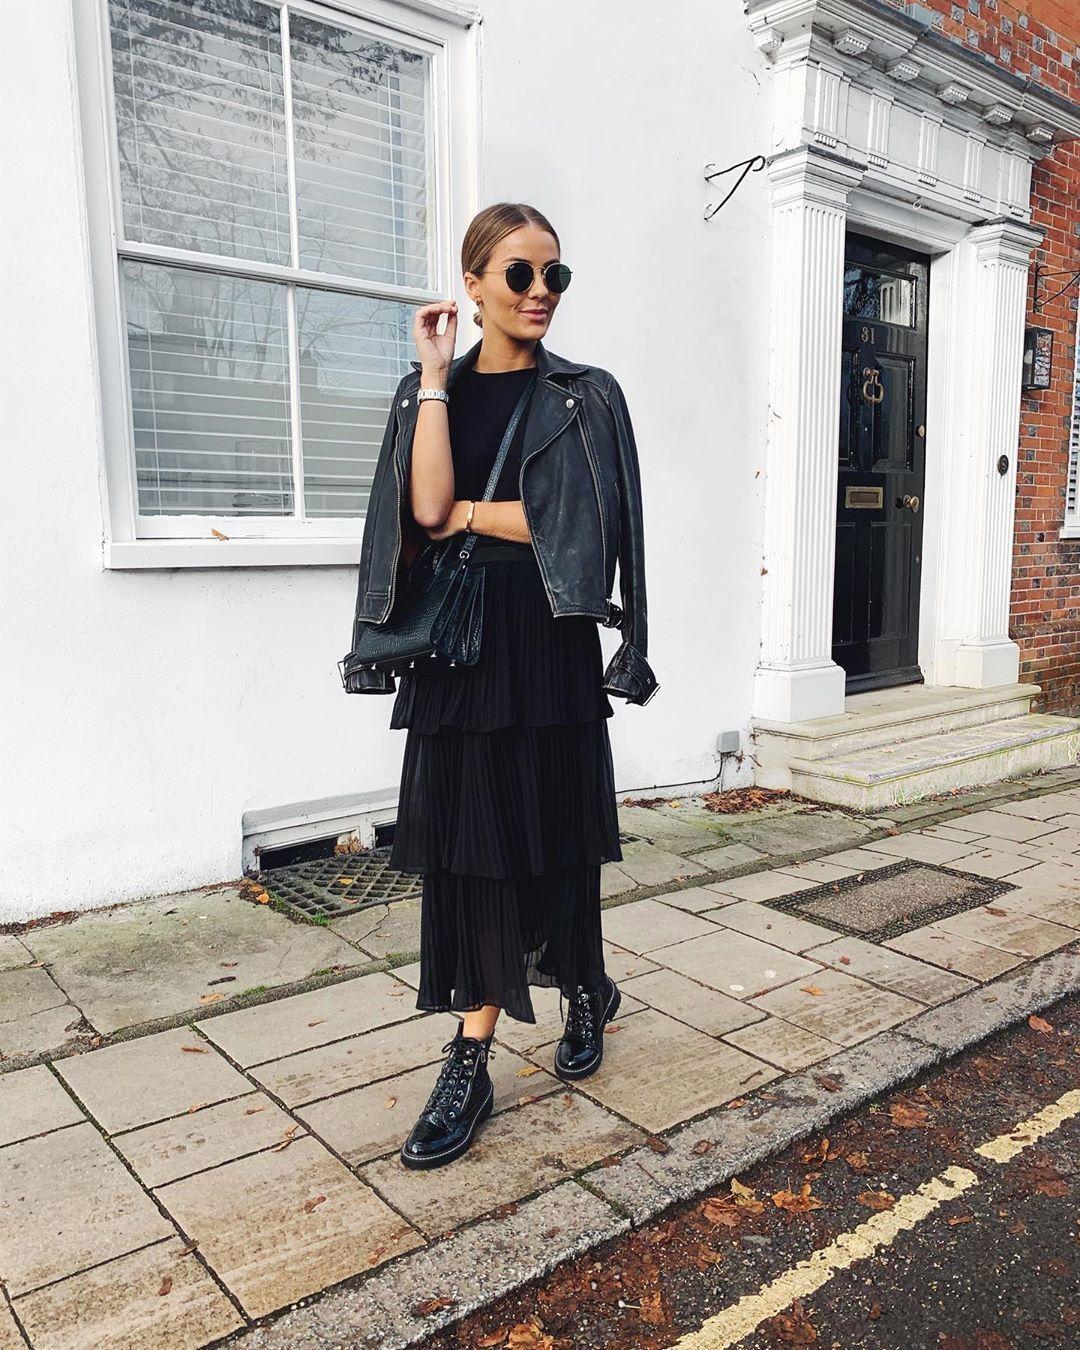 skirt black skirt ruffle ankle boots black boots black leather jacket black top black bag